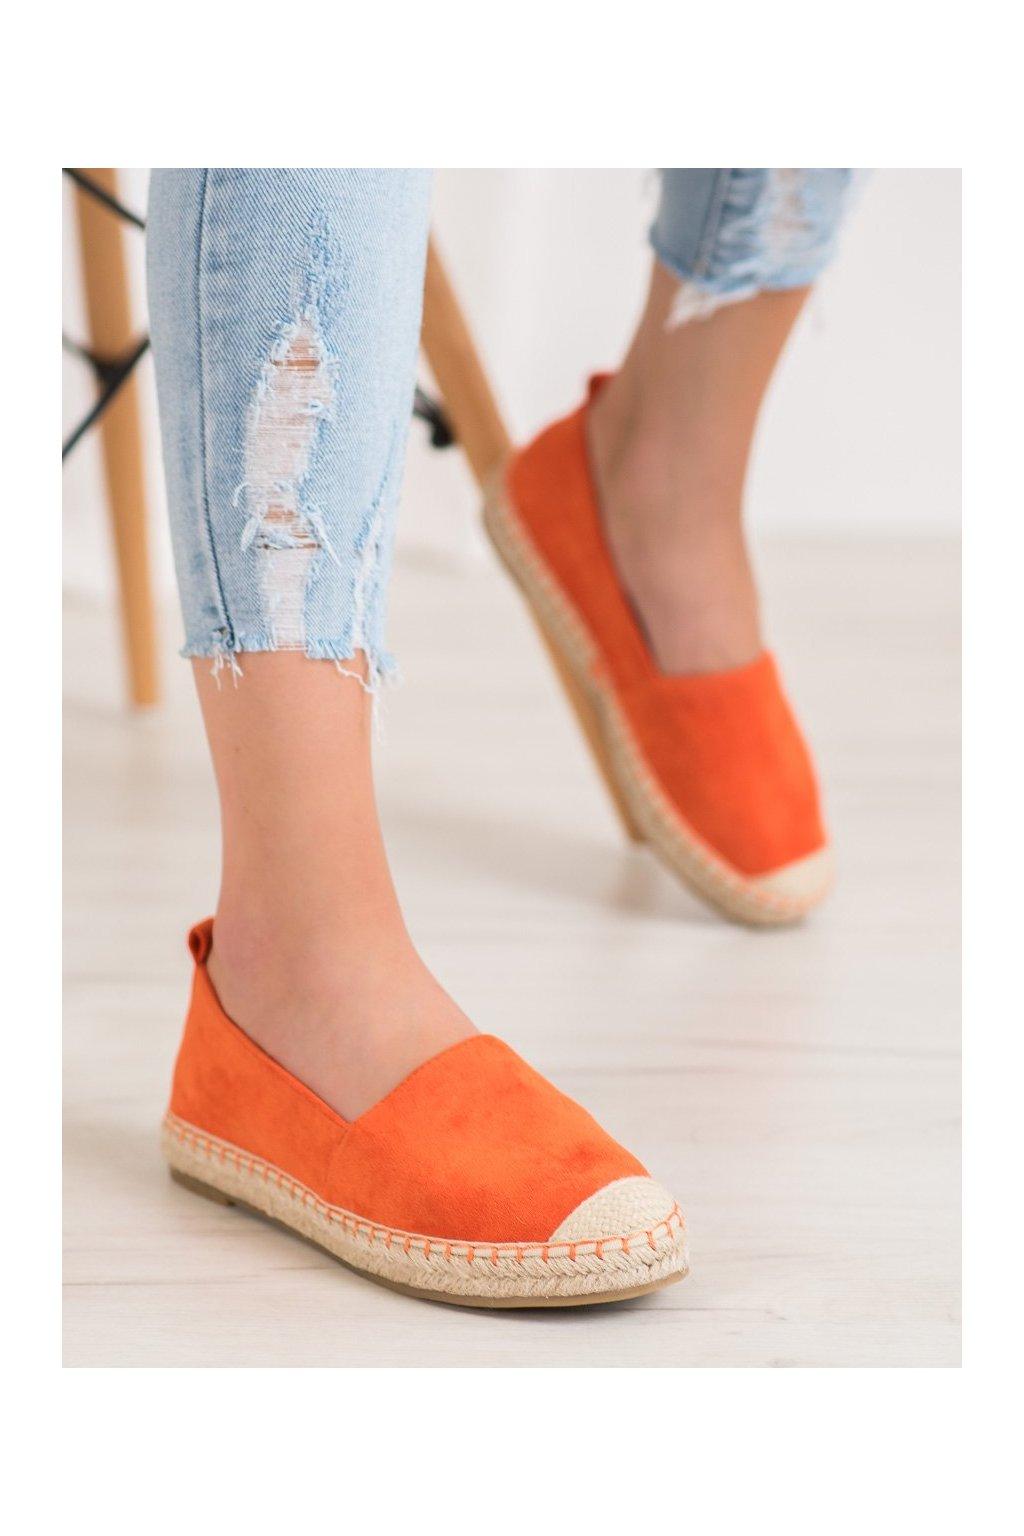 Oranžové tenisky Anesia paris kod L-1068OR